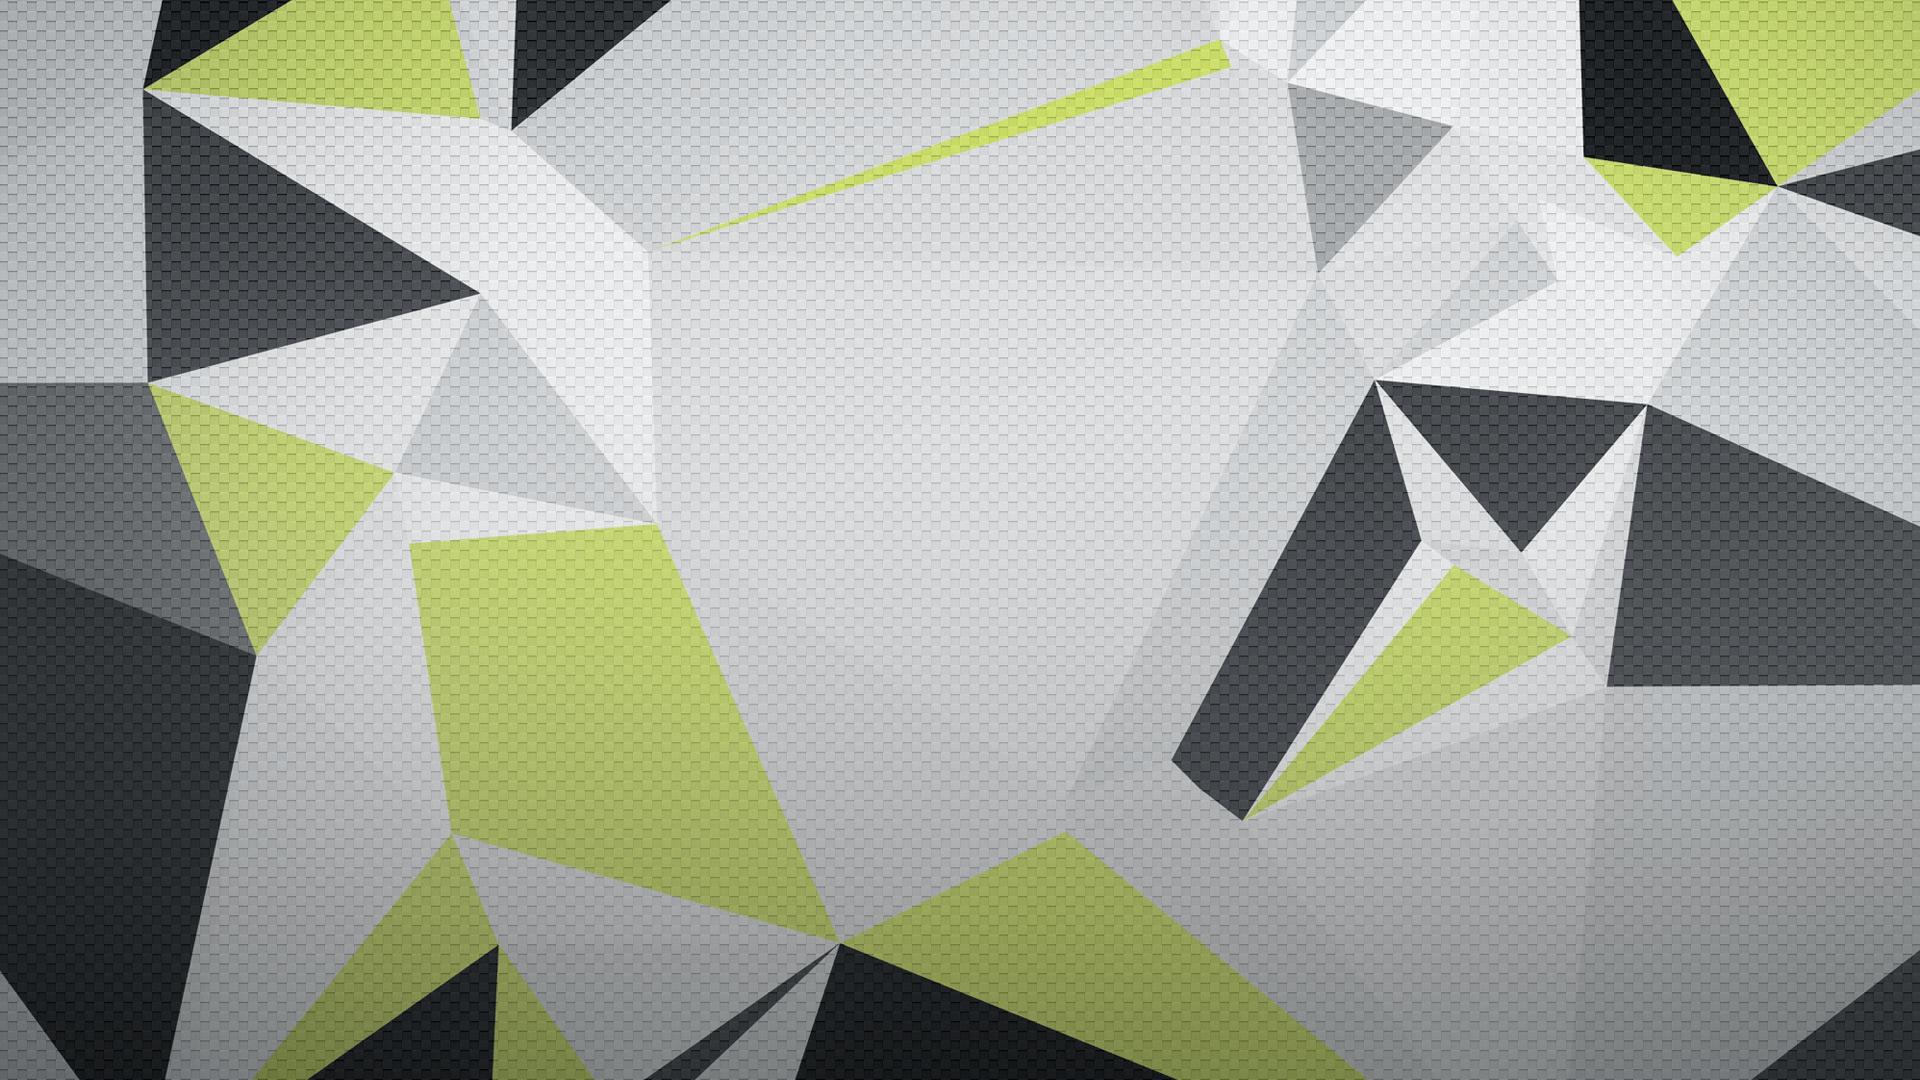 10 Wonderful HD Geometric Wallpapers - HDWallSource.com